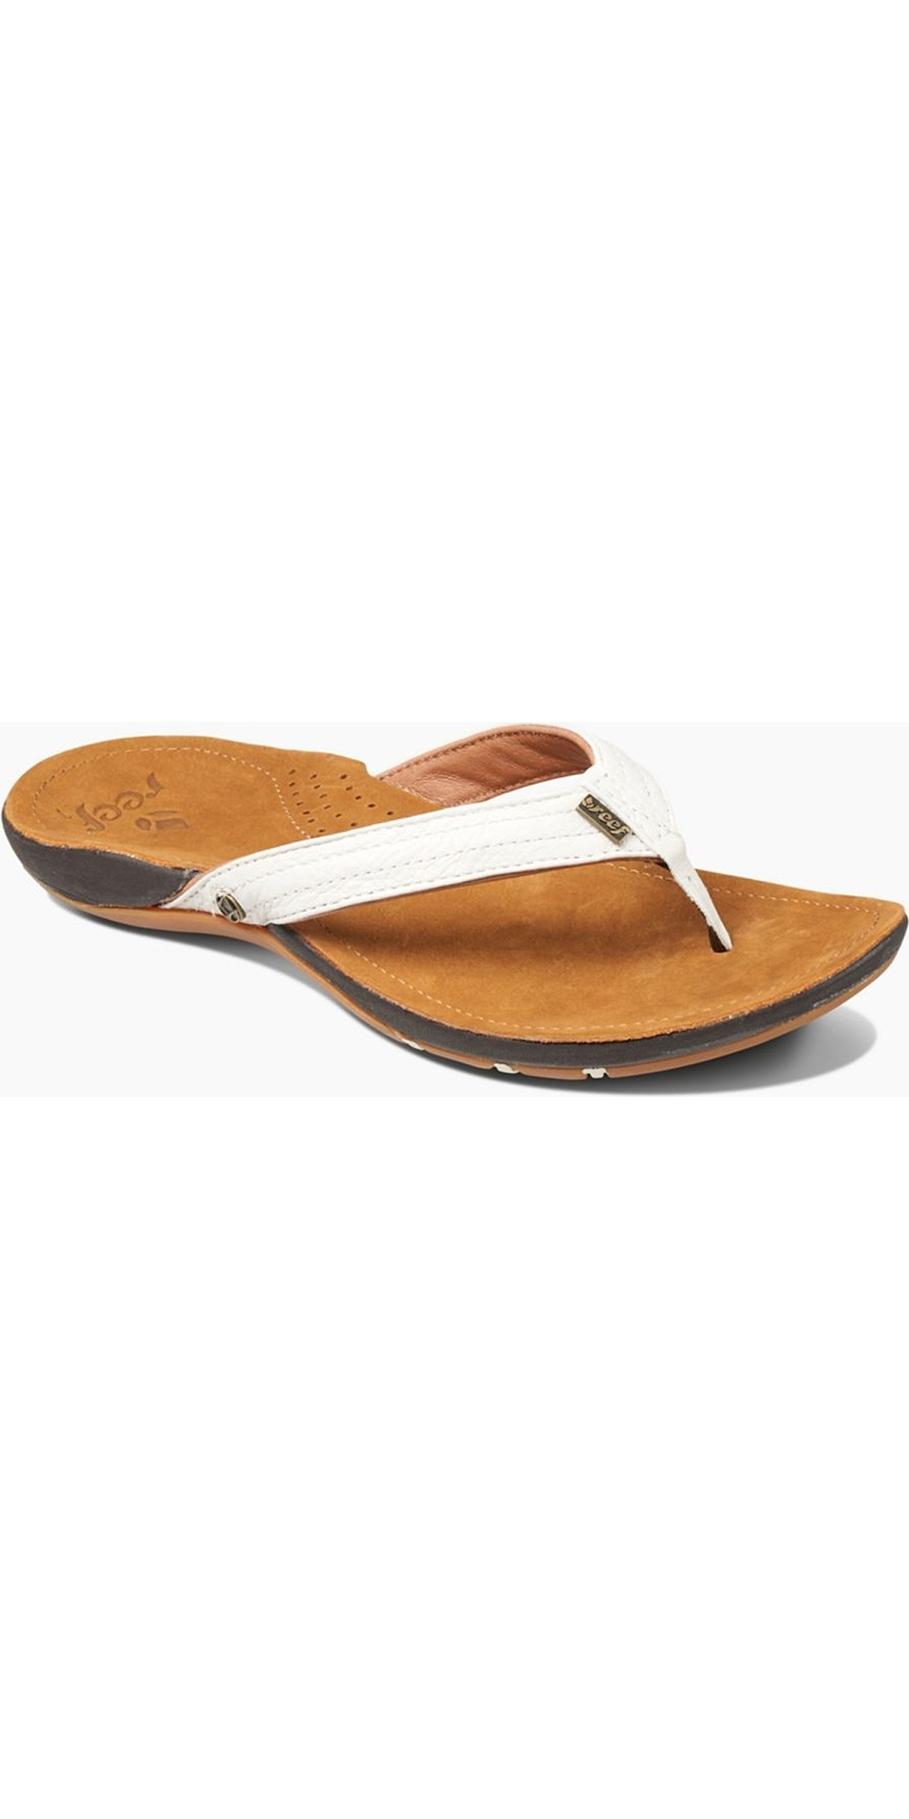 new product 33f87 4ef9c 2019 Reef Womens Miss J-Bay Sandals / Flip Flops Tan / White RF001241